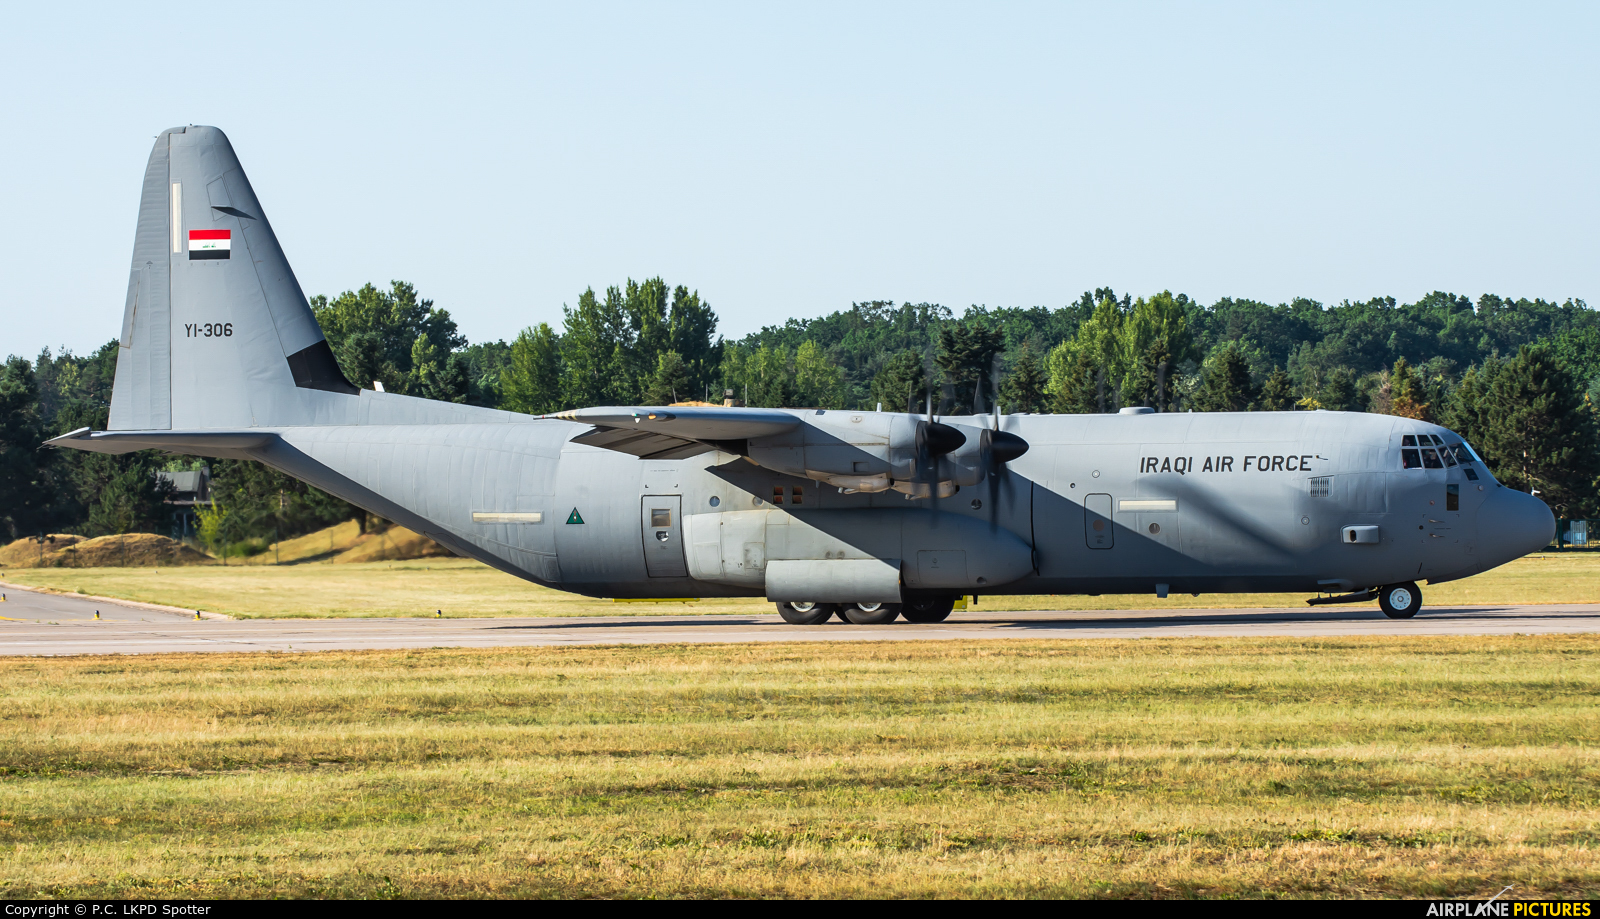 Iraq - Air Force YI-306 aircraft at Pardubice